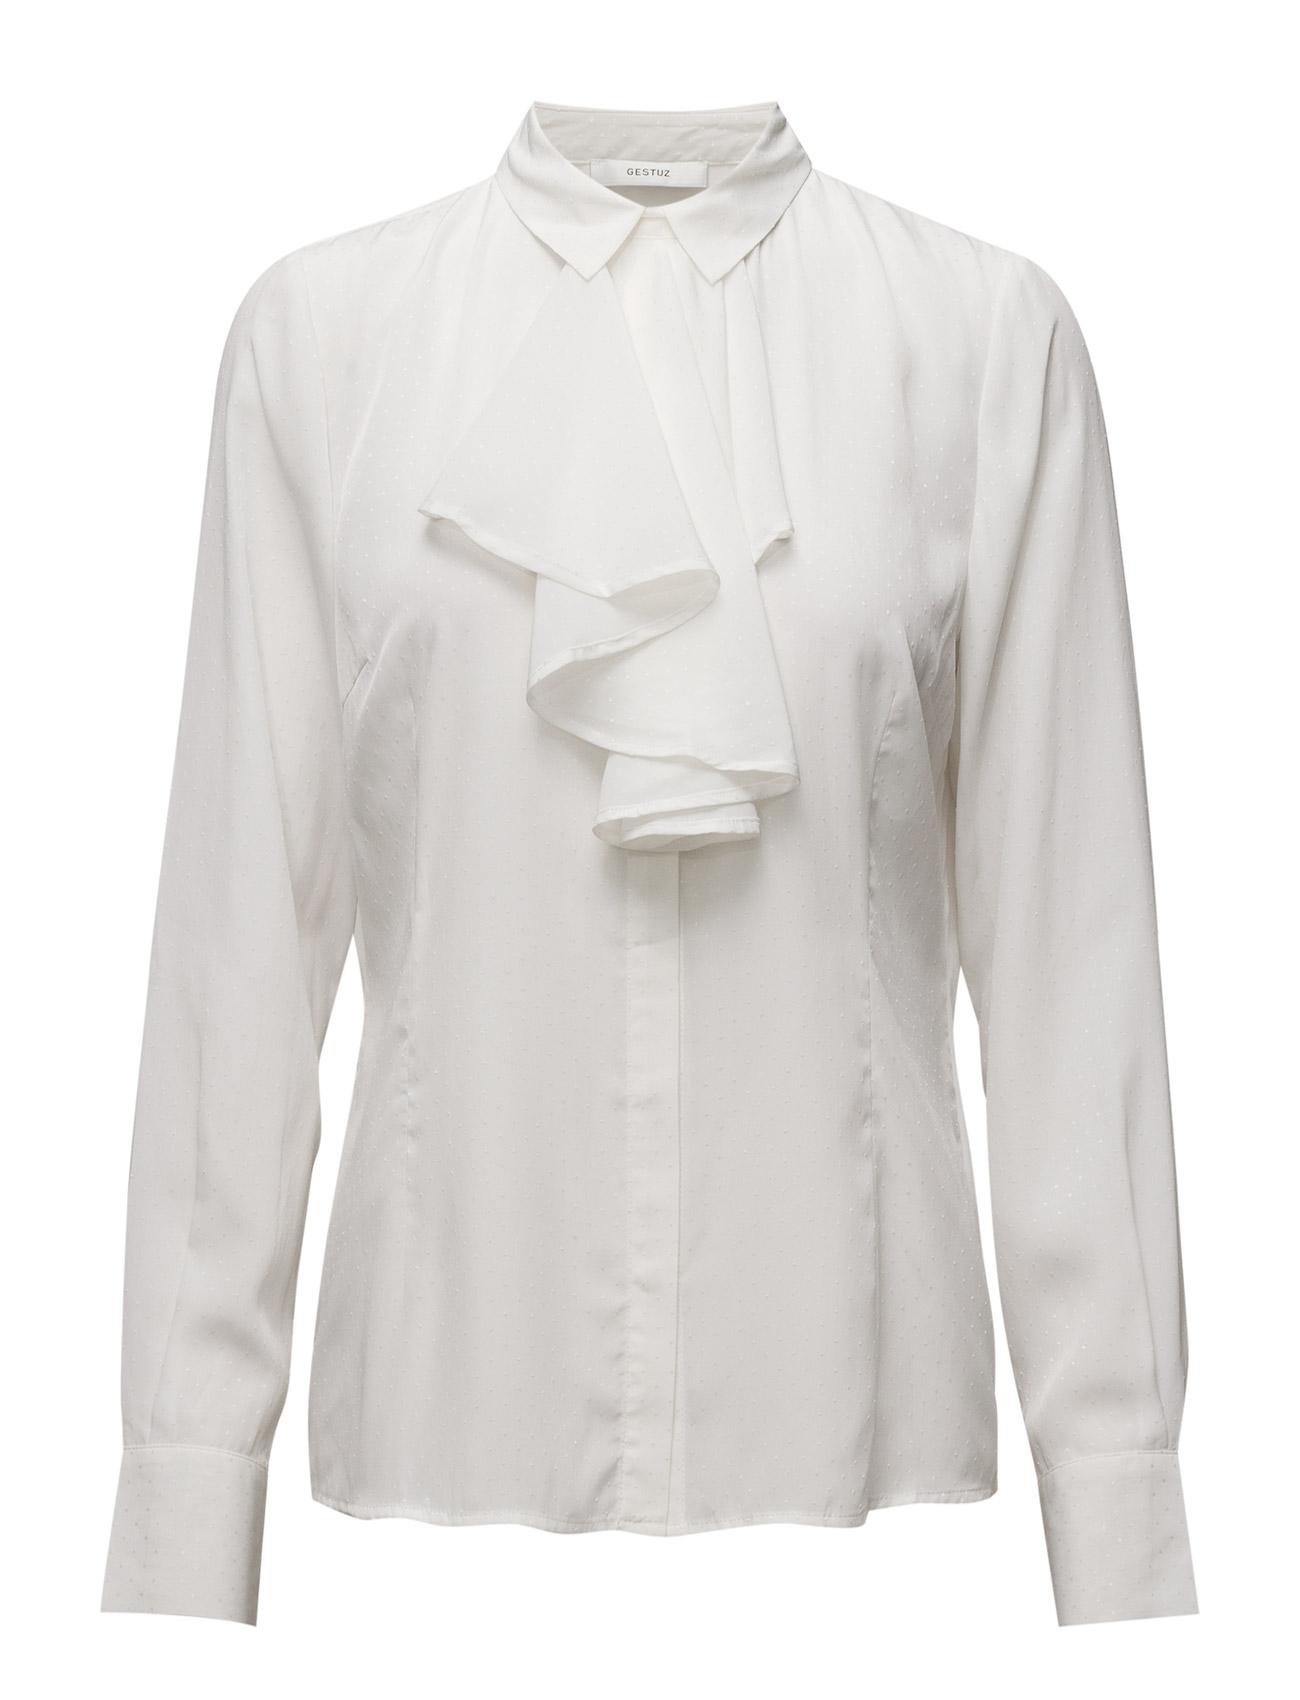 Lizzy Shirt Ye16 Gestuz Langærmede til Kvinder i Cherry mahogni Print